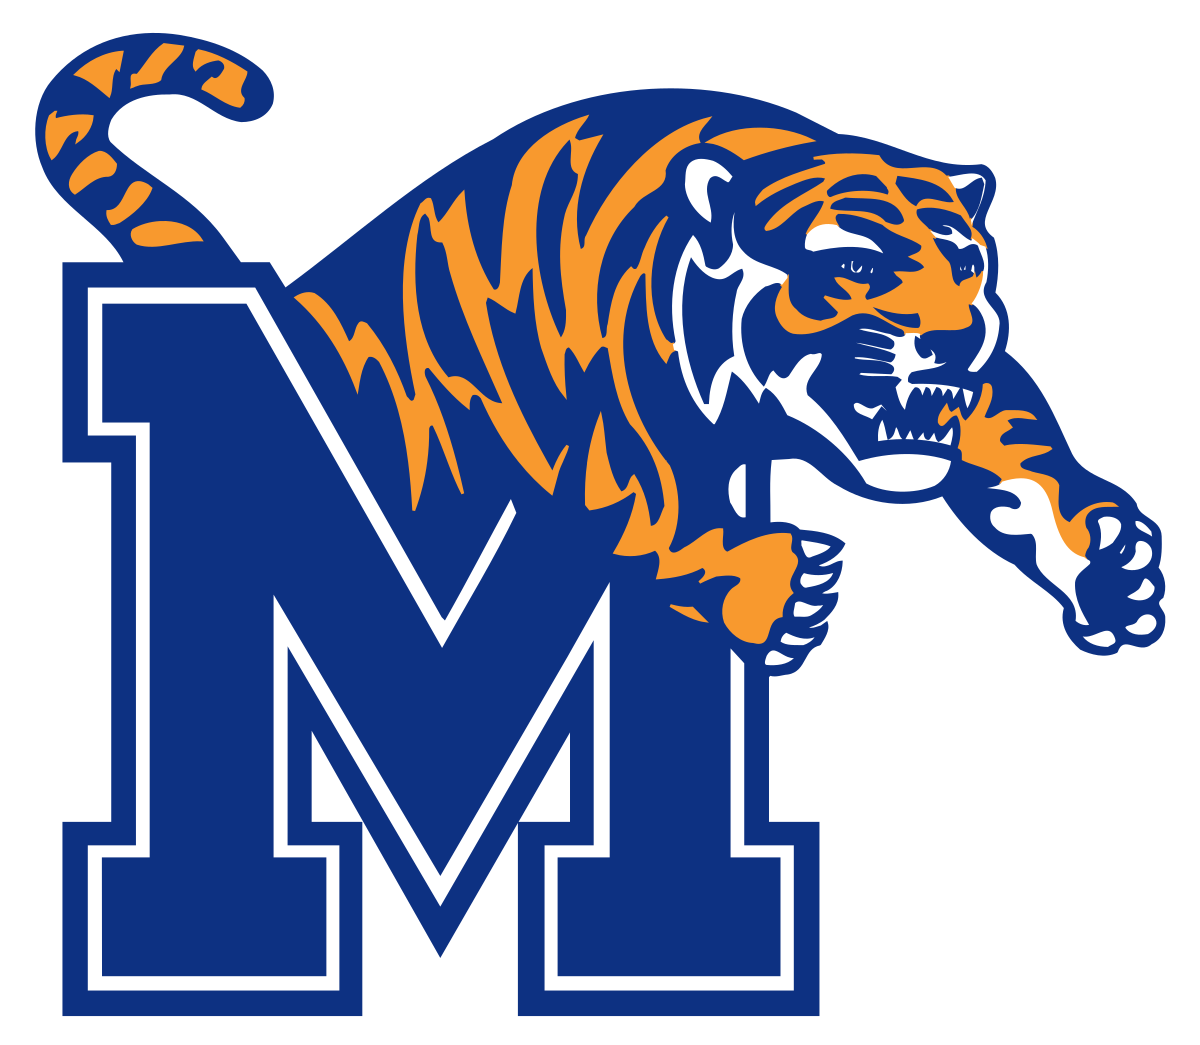 Wildcat clipart bearcats cincinnati. Memphis tigers wikipedia